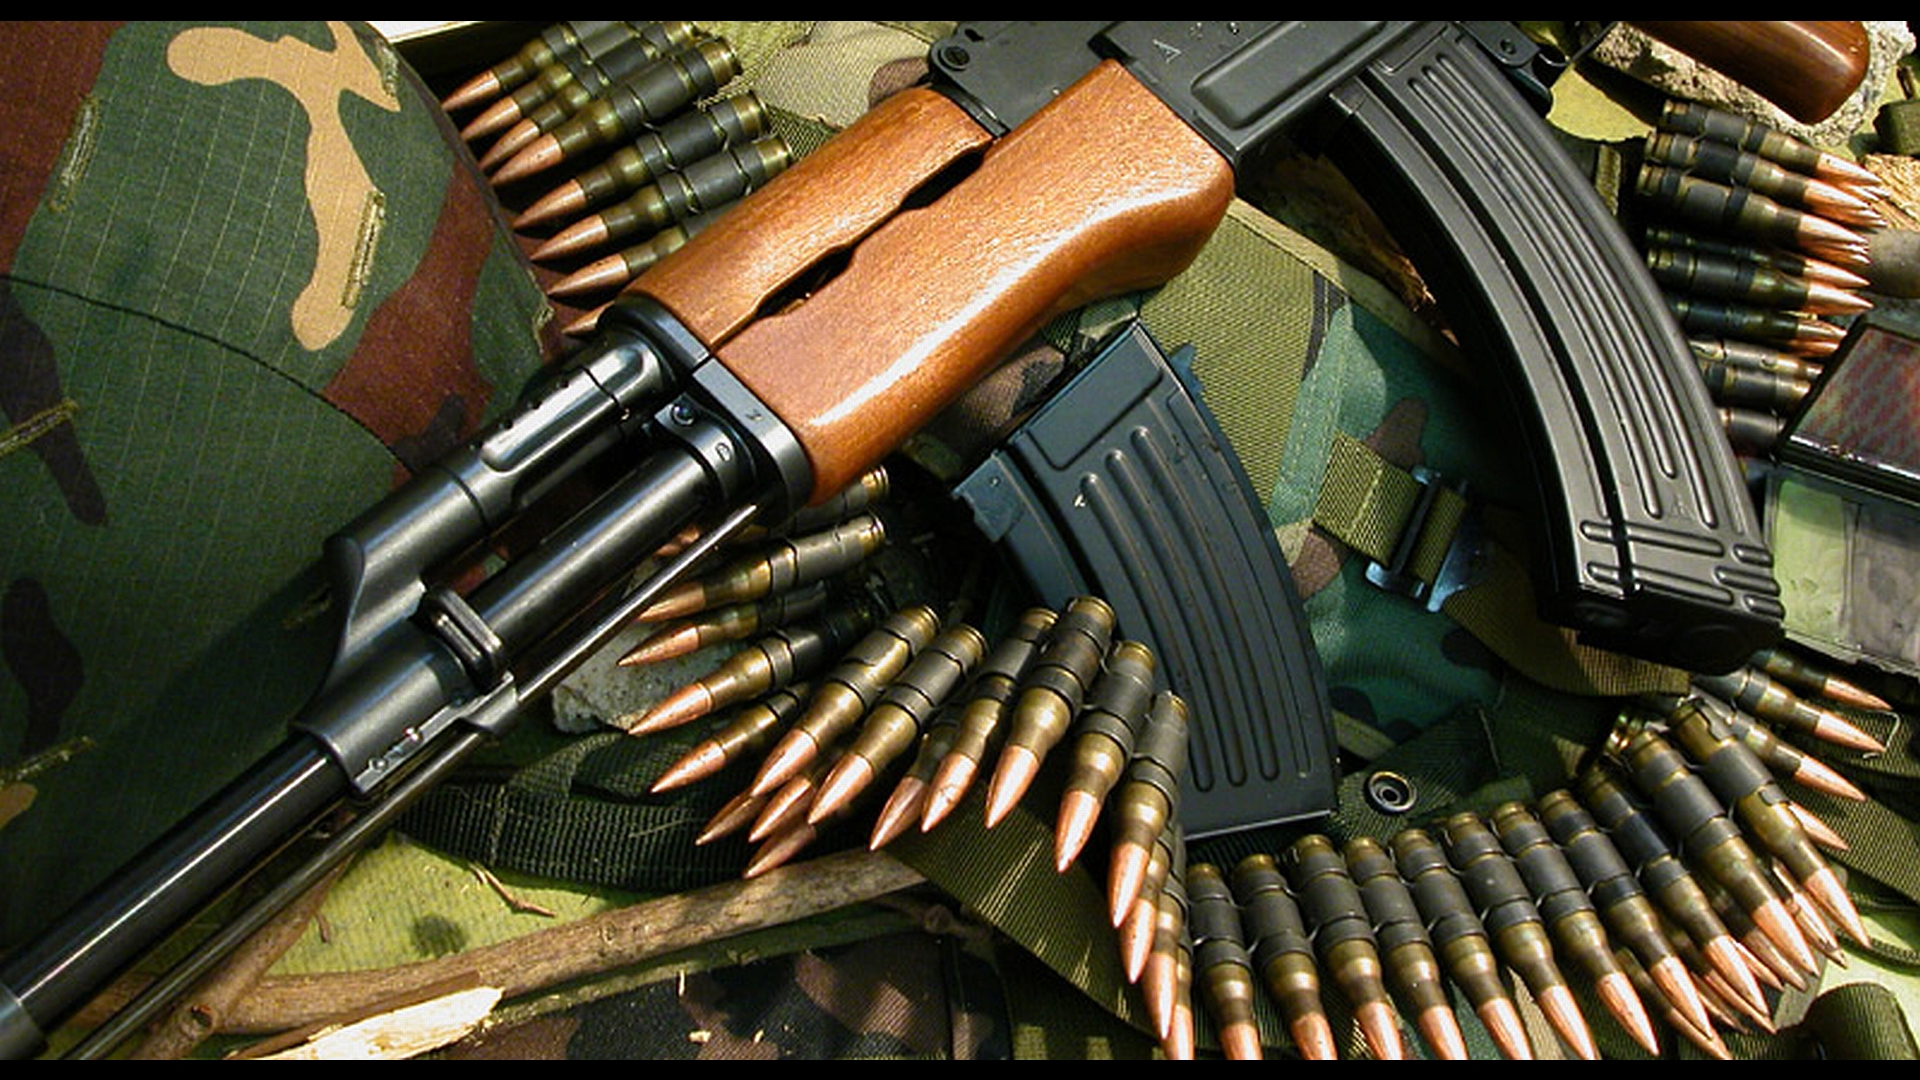 Akm Assault Rifle Full HD Wallpaper And Background Image